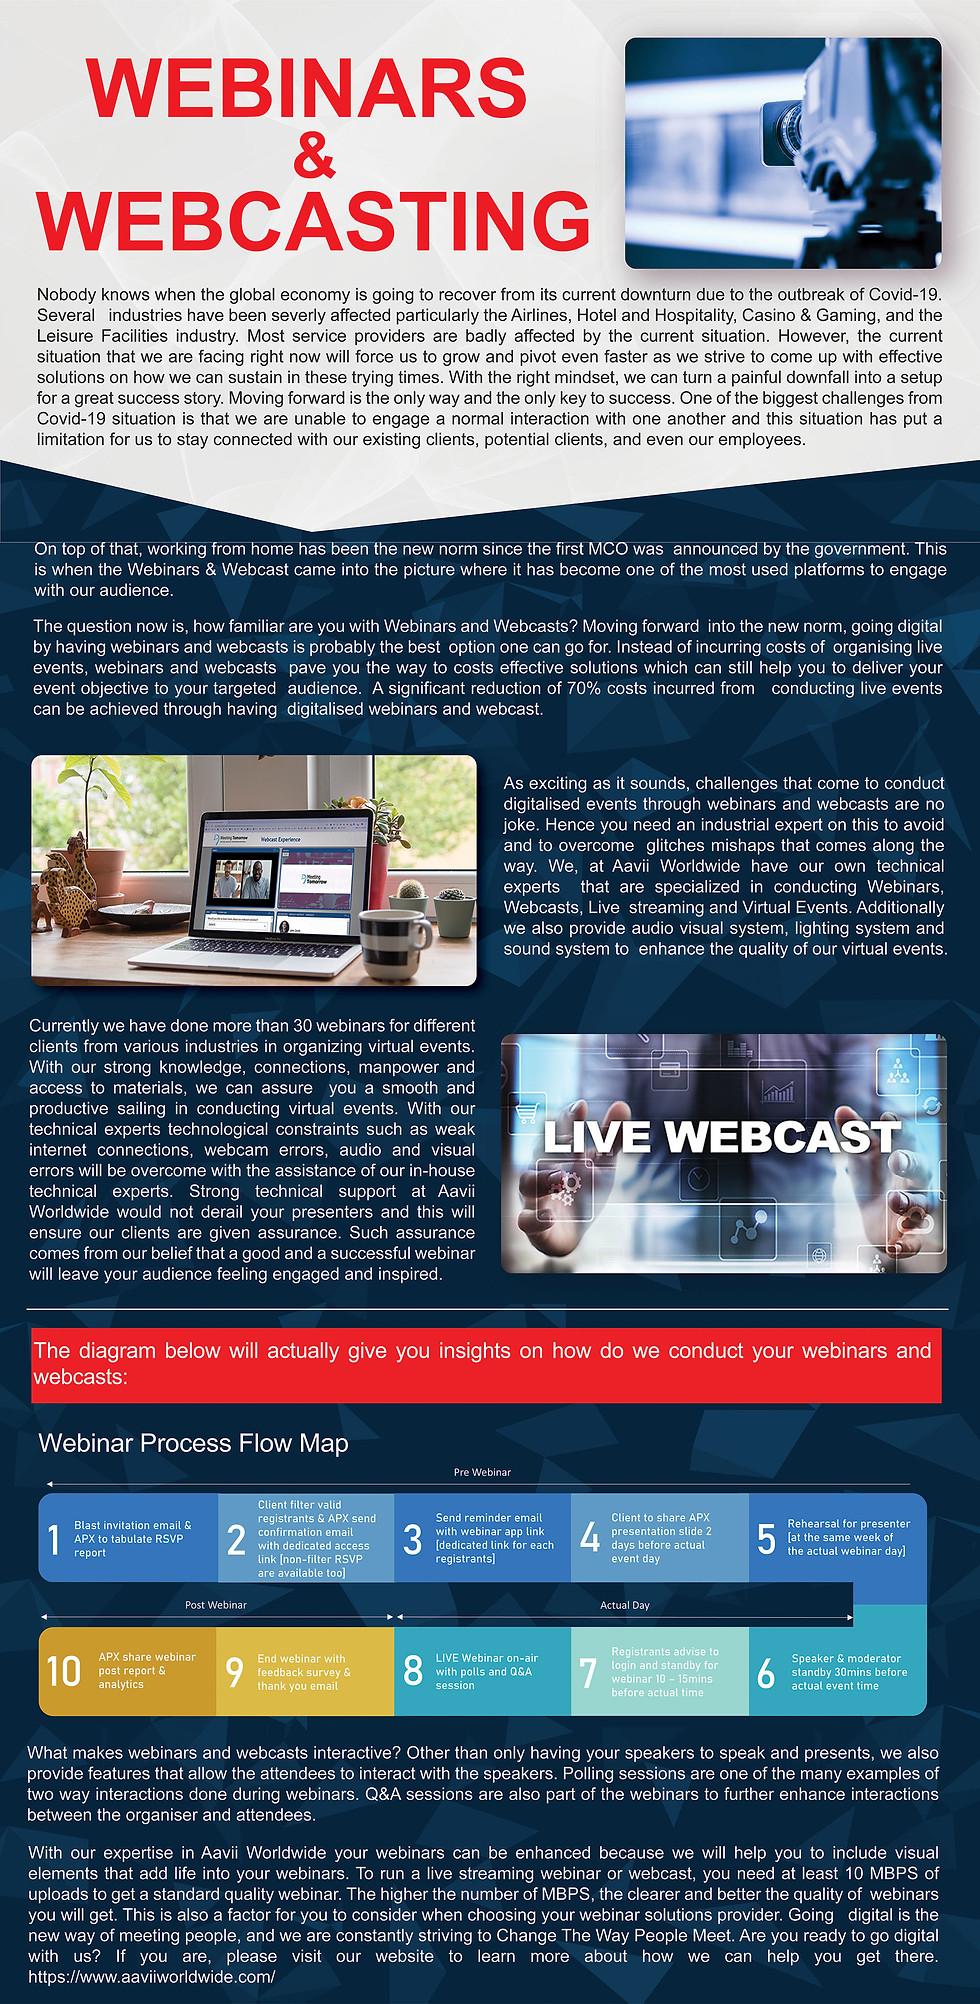 Webinar & Webcasting_1st draft-01.jpg